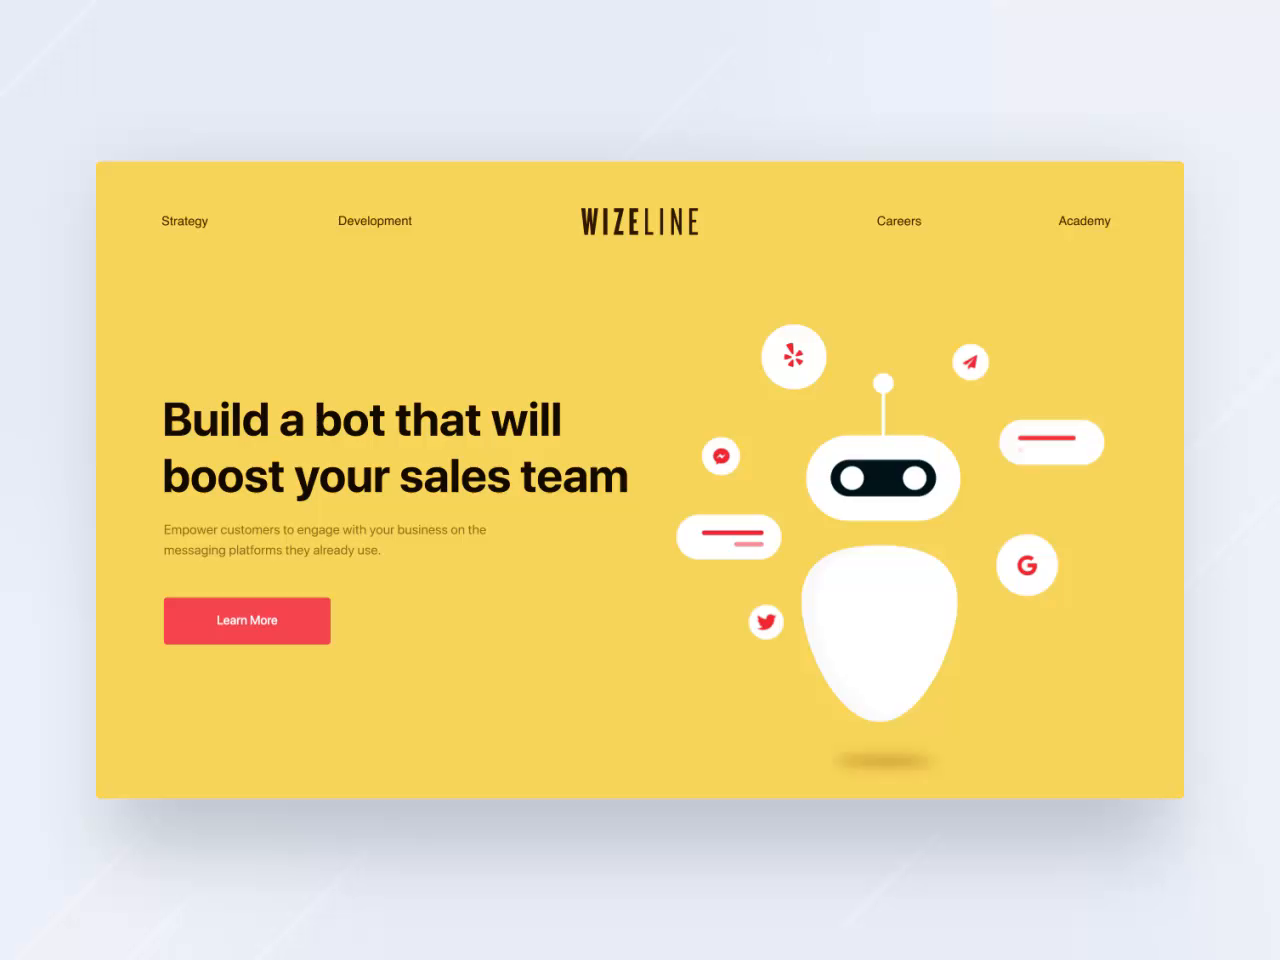 Wizeline Marketing Website Design By Ramotion In 2020 Web Design Website Design Best Web Design